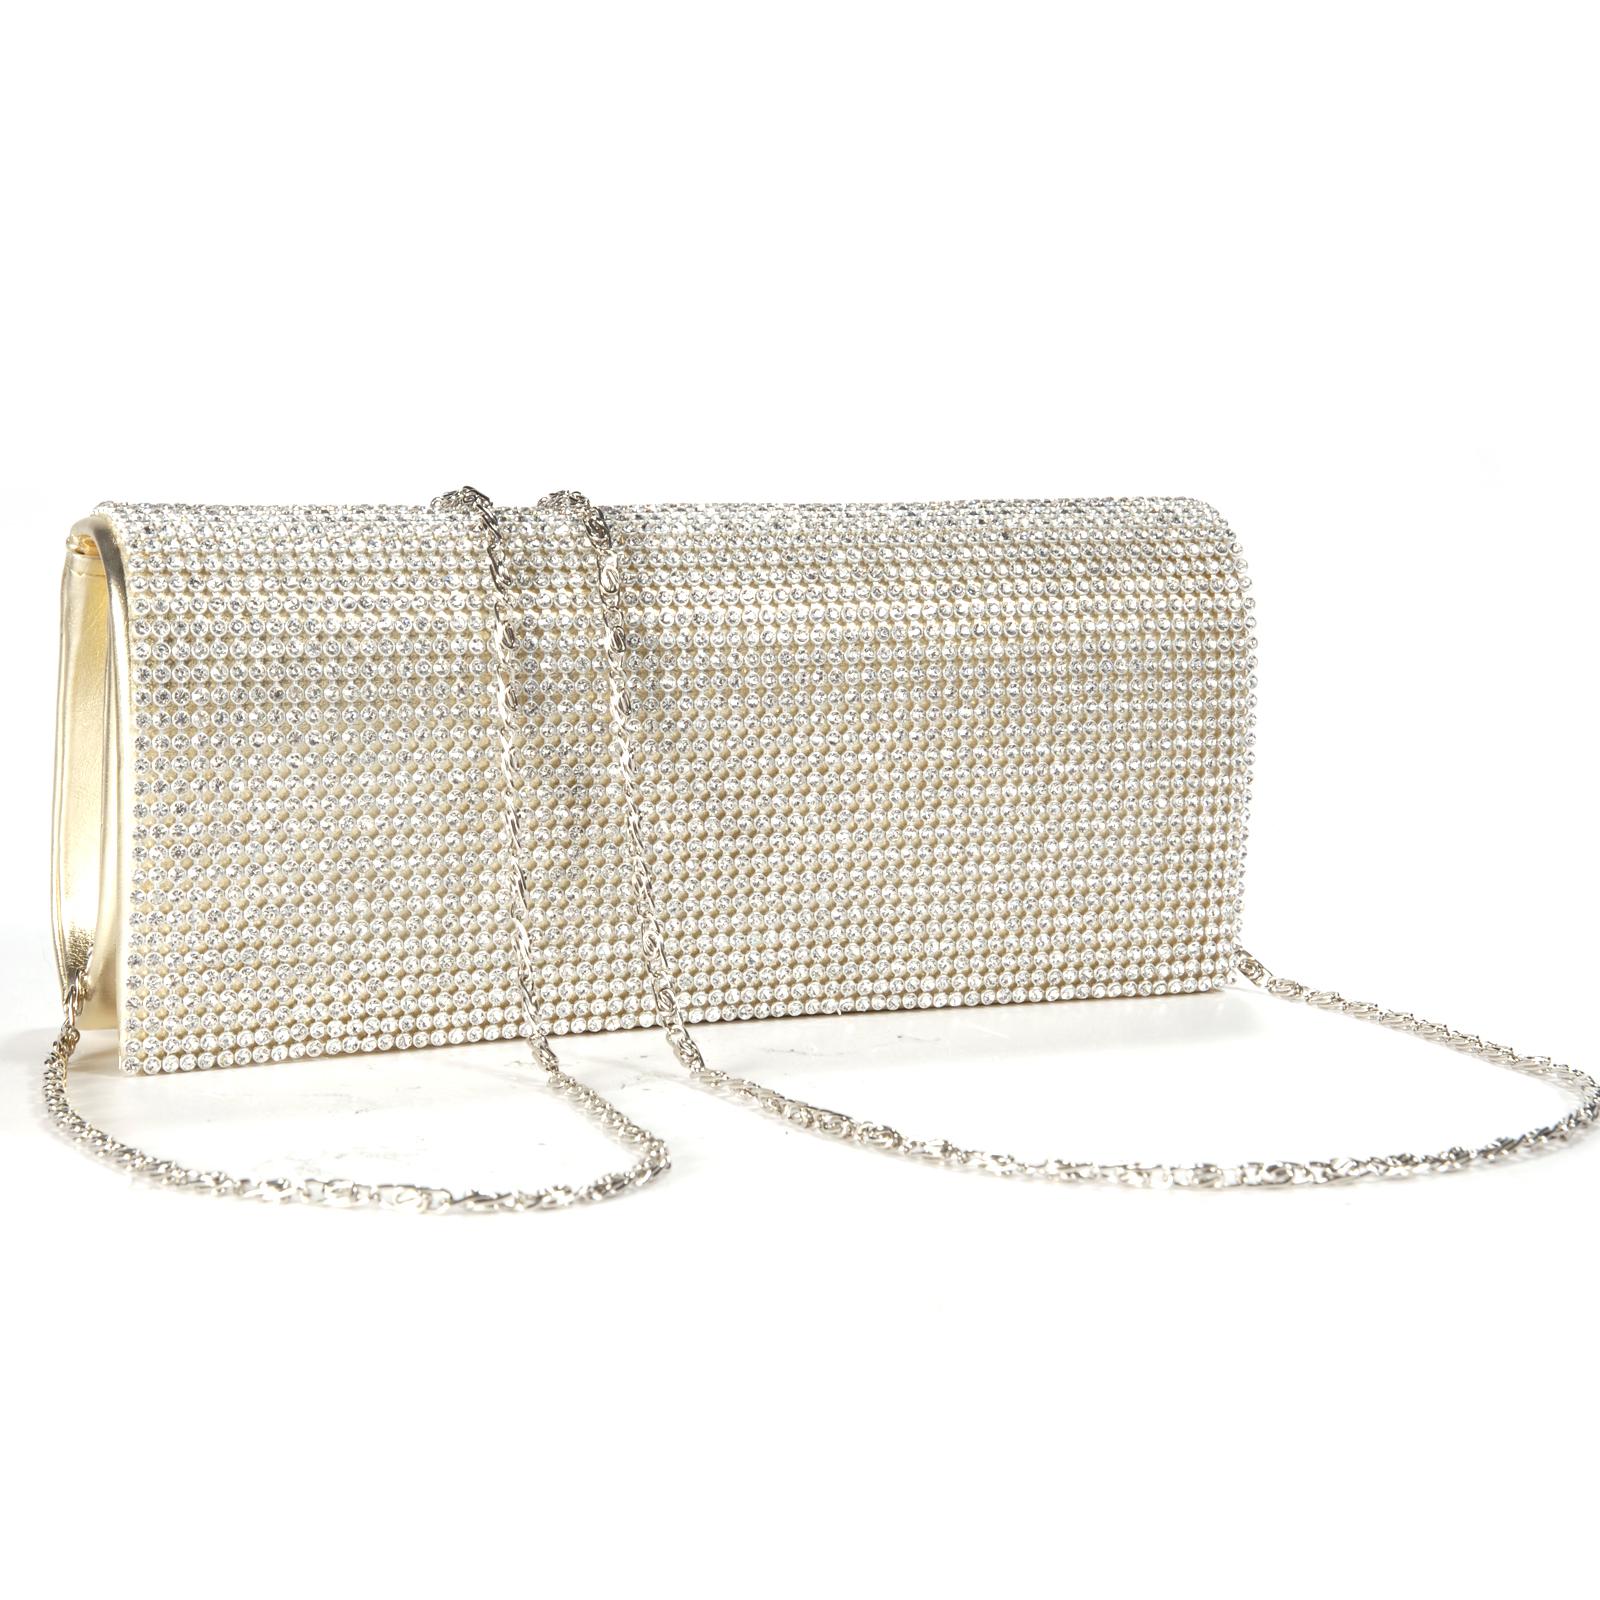 Shimmering Gold Diamante Evening Bag Clutch Purse Wedding ...